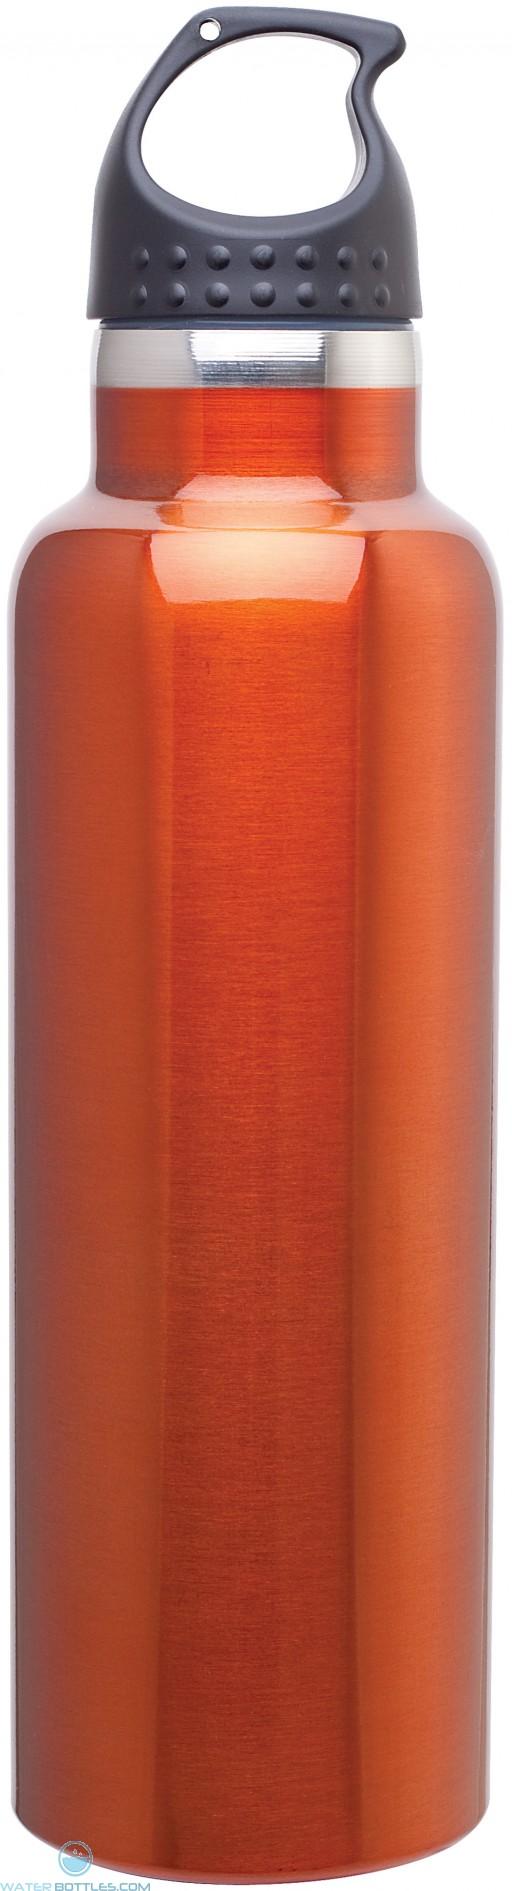 H2go Volt Vacuum SS Bottles | 20 oz - Orange